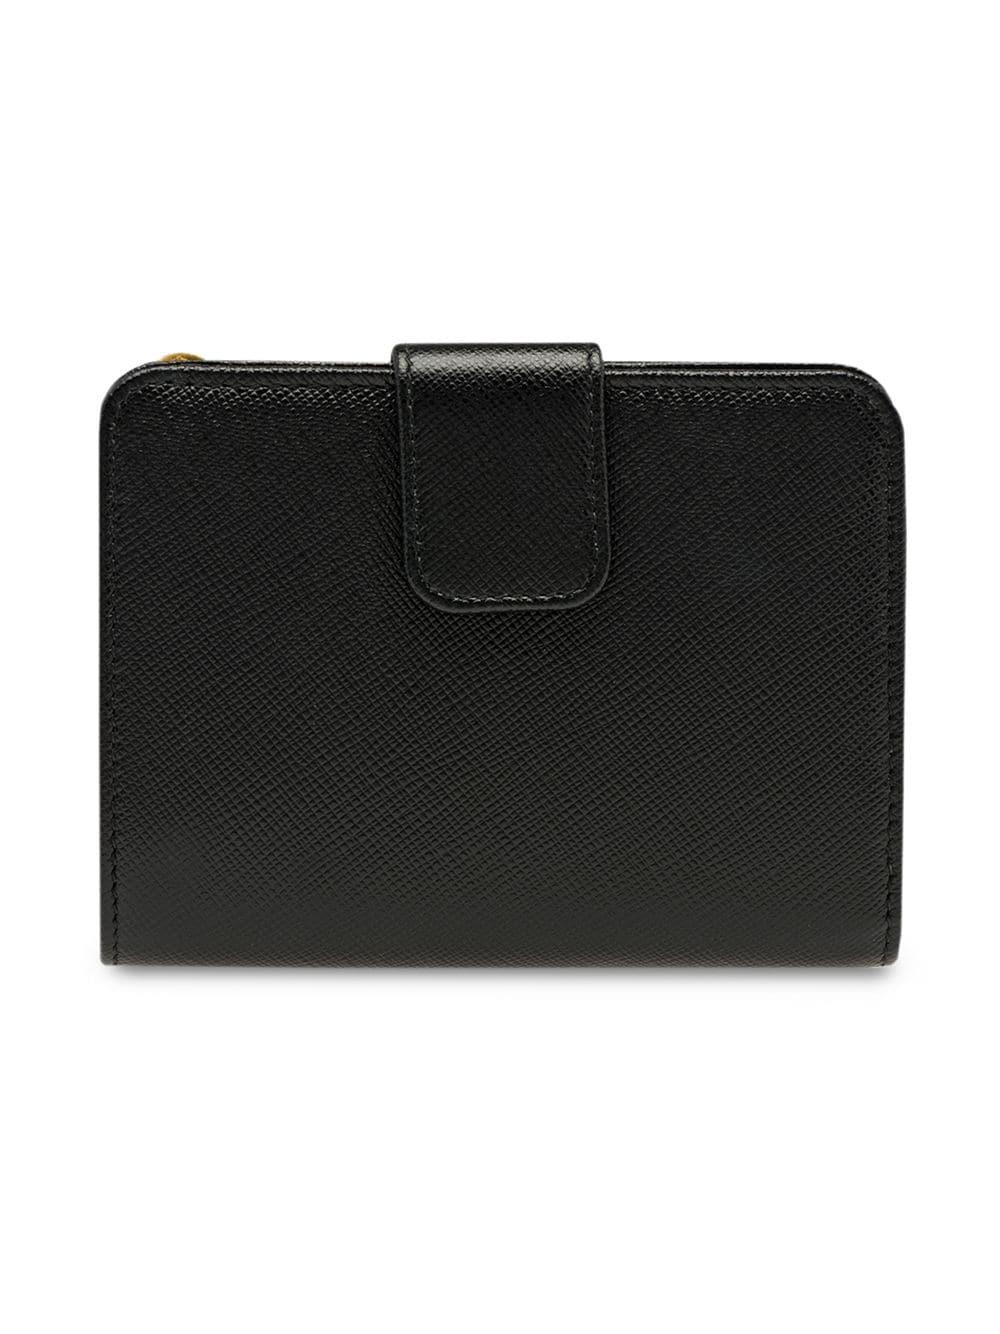 8c4ca837db1f Prada - Black Logo Zipped Wallet - Lyst. View fullscreen